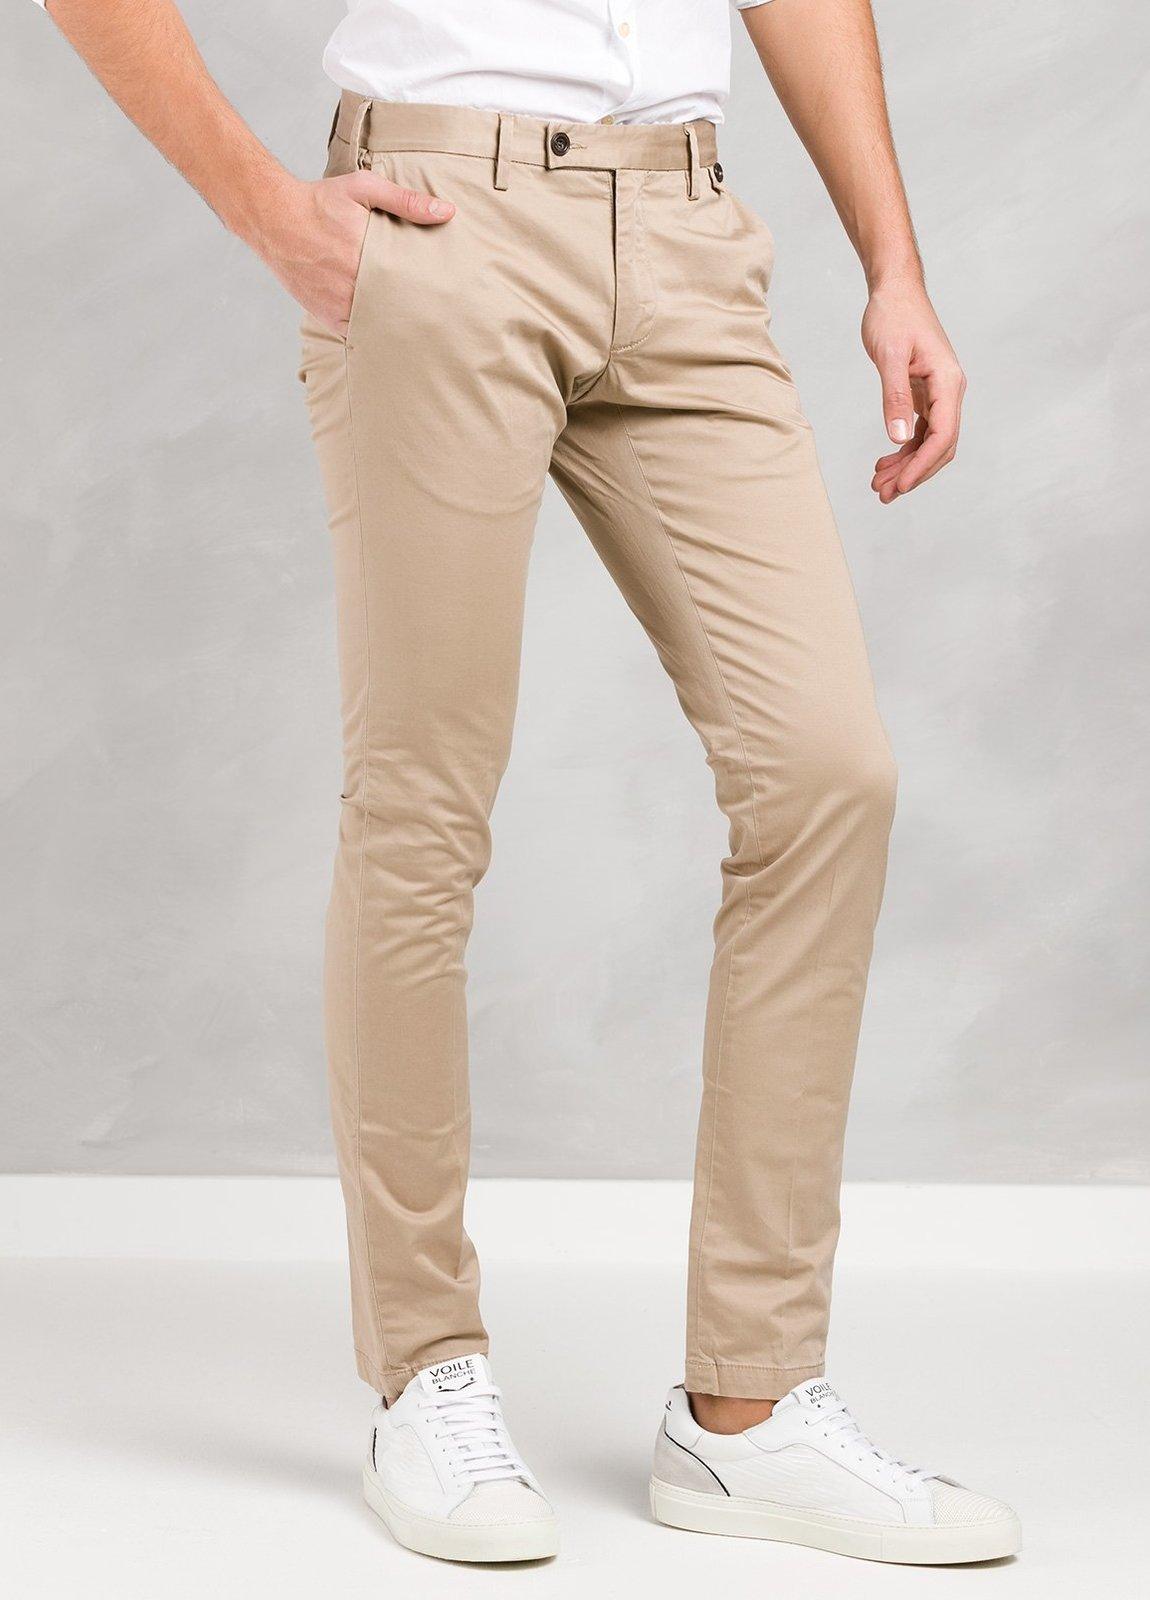 Pantalón sport color beige ligeramente slim fit, algodón satinado. - Ítem1